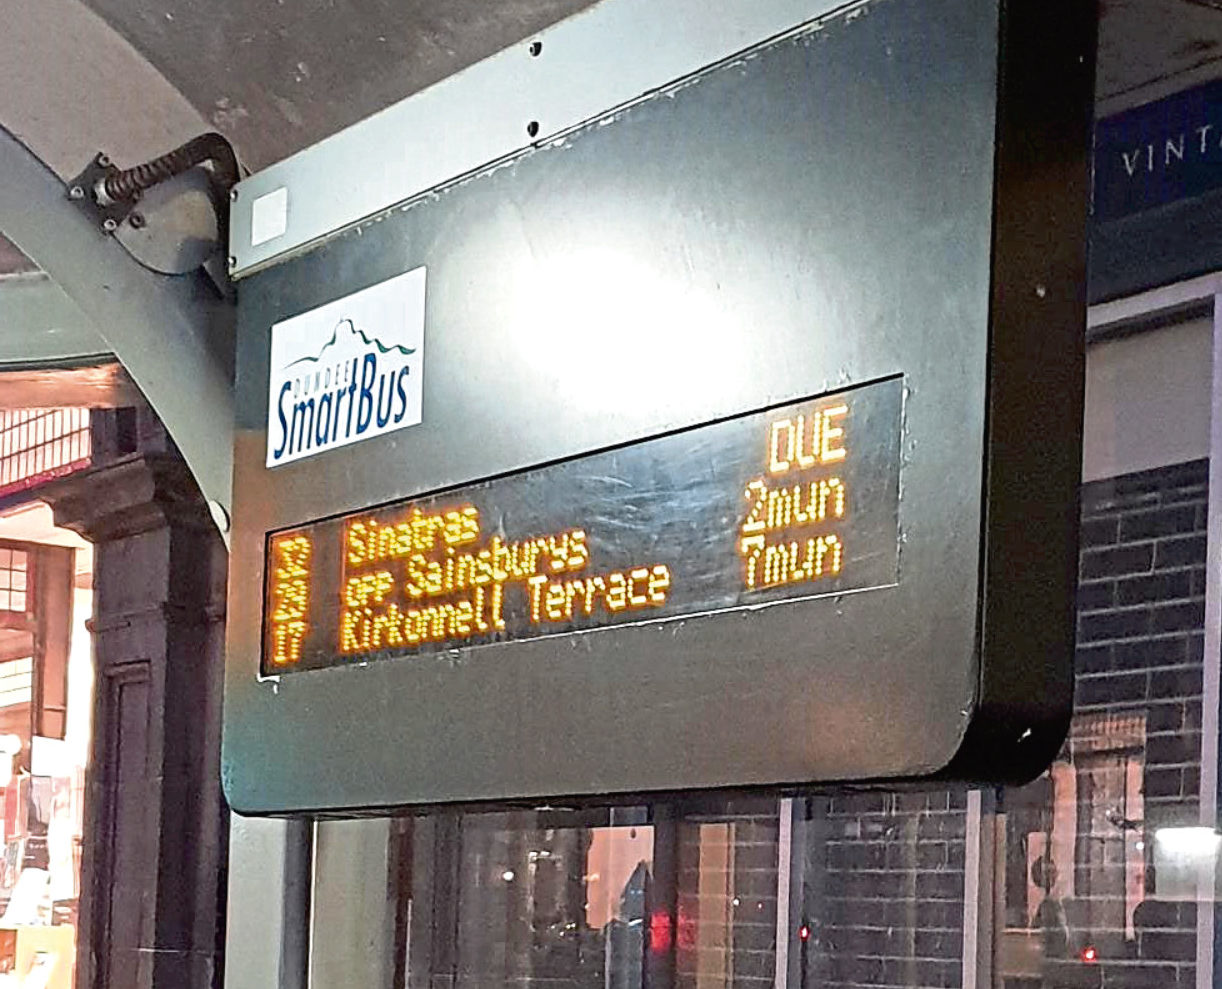 Bus sign showing Sinatras as a destination